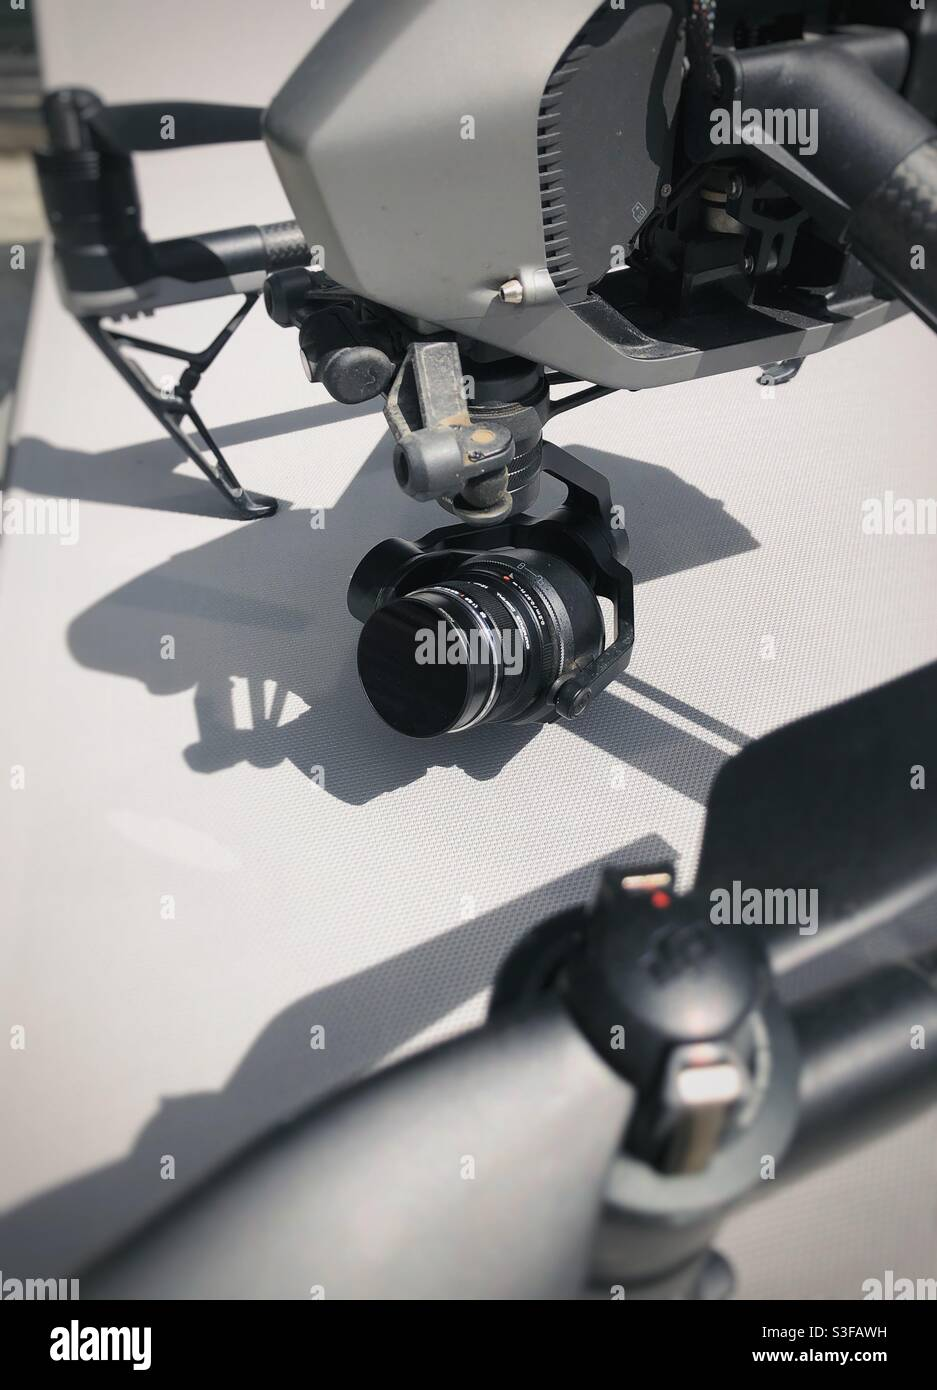 Kamera und Objektiv auf dem Gimbal einer DJI-Drohne Stockfoto